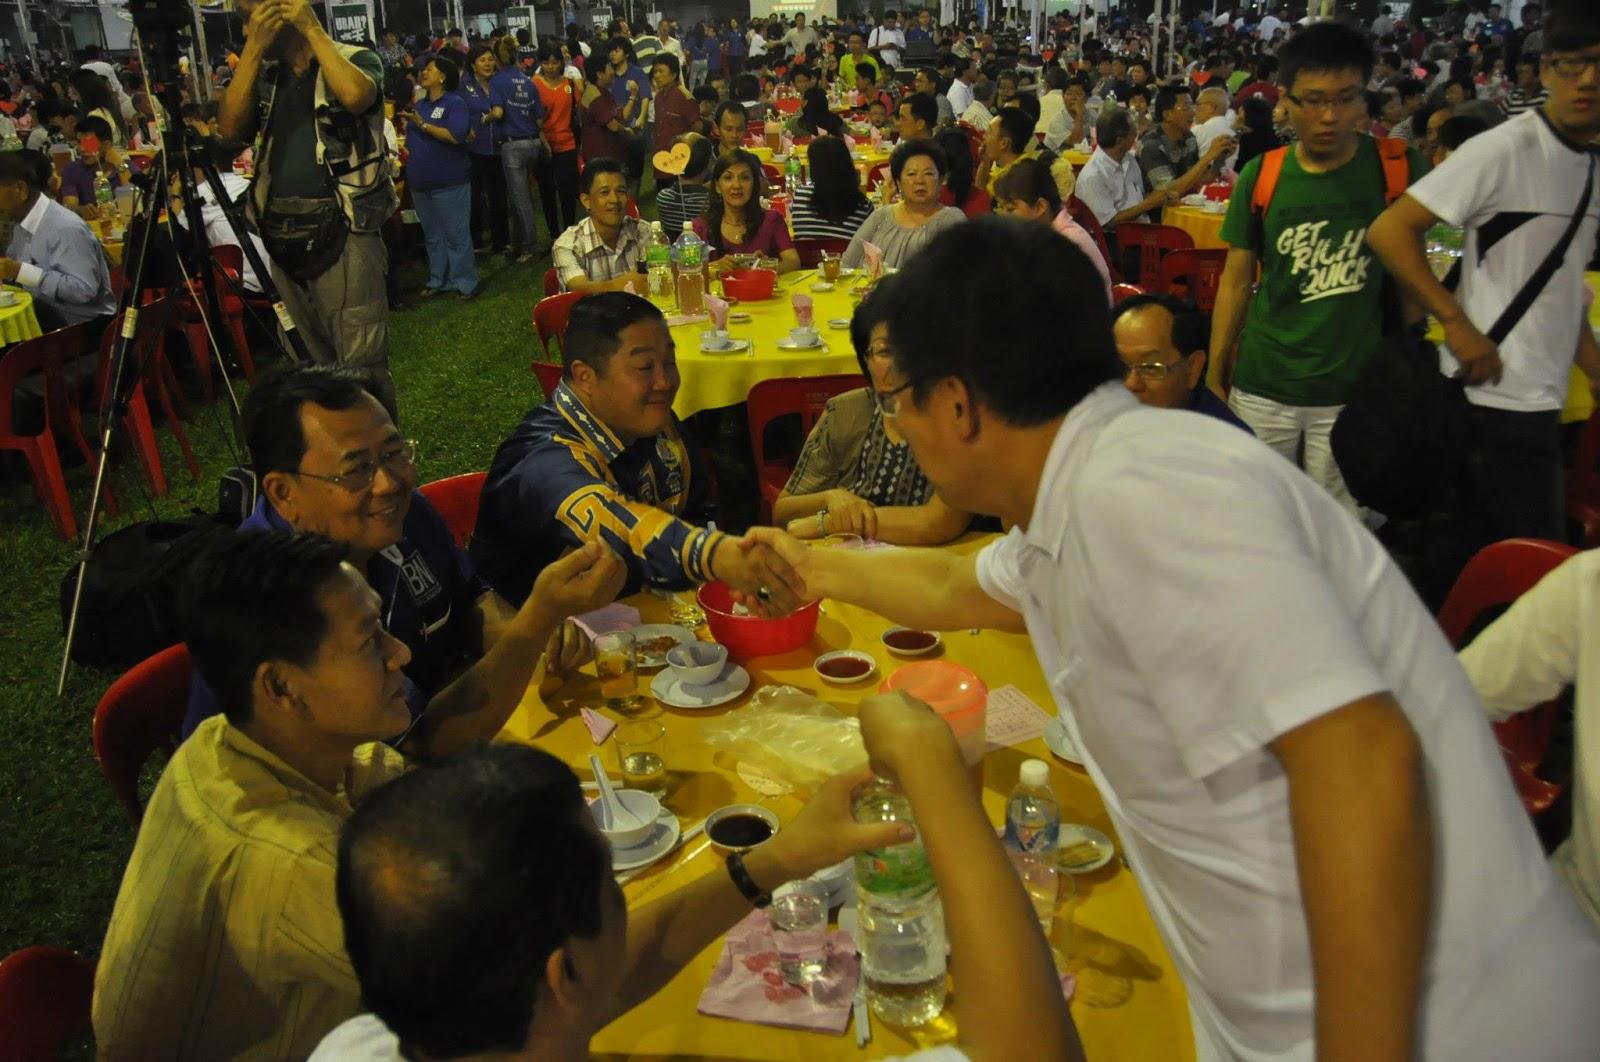 謝國華──真心從政: 13.10.12 MCA Mega dinner themed Stability Above Chaos